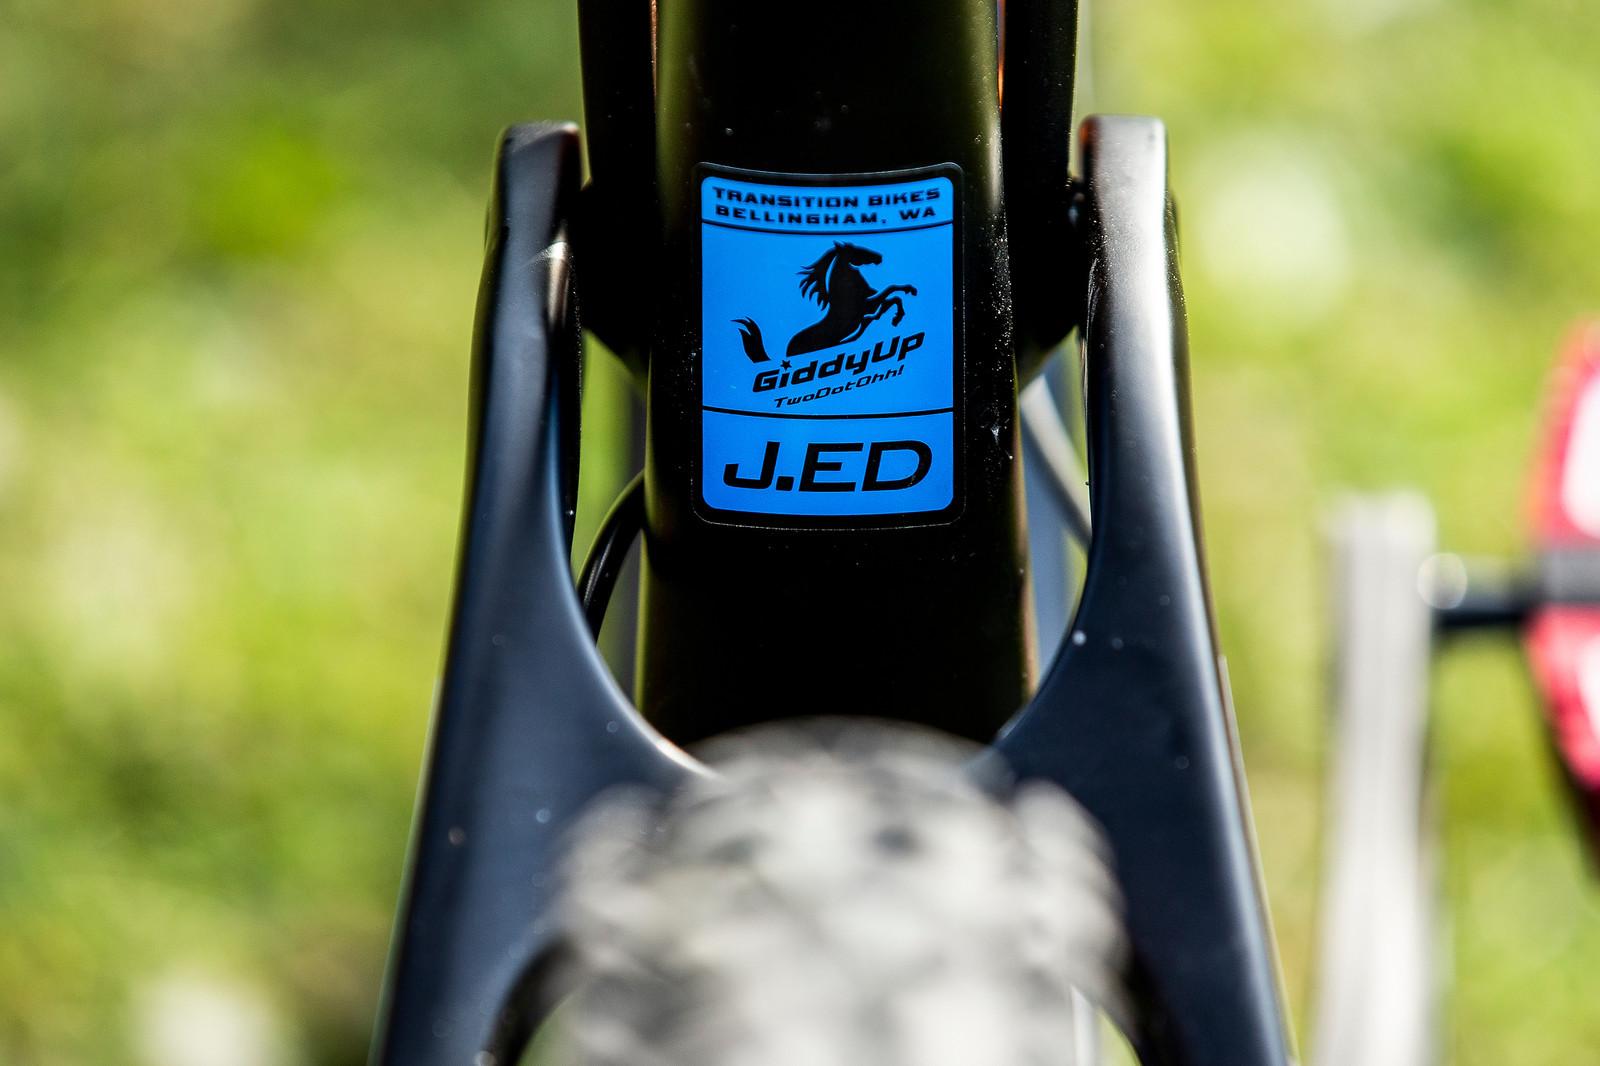 Giddy Up! - WORLD CHAMPS BIKE - Jamie Edmondson's Transition TR11 - Mountain Biking Pictures - Vital MTB